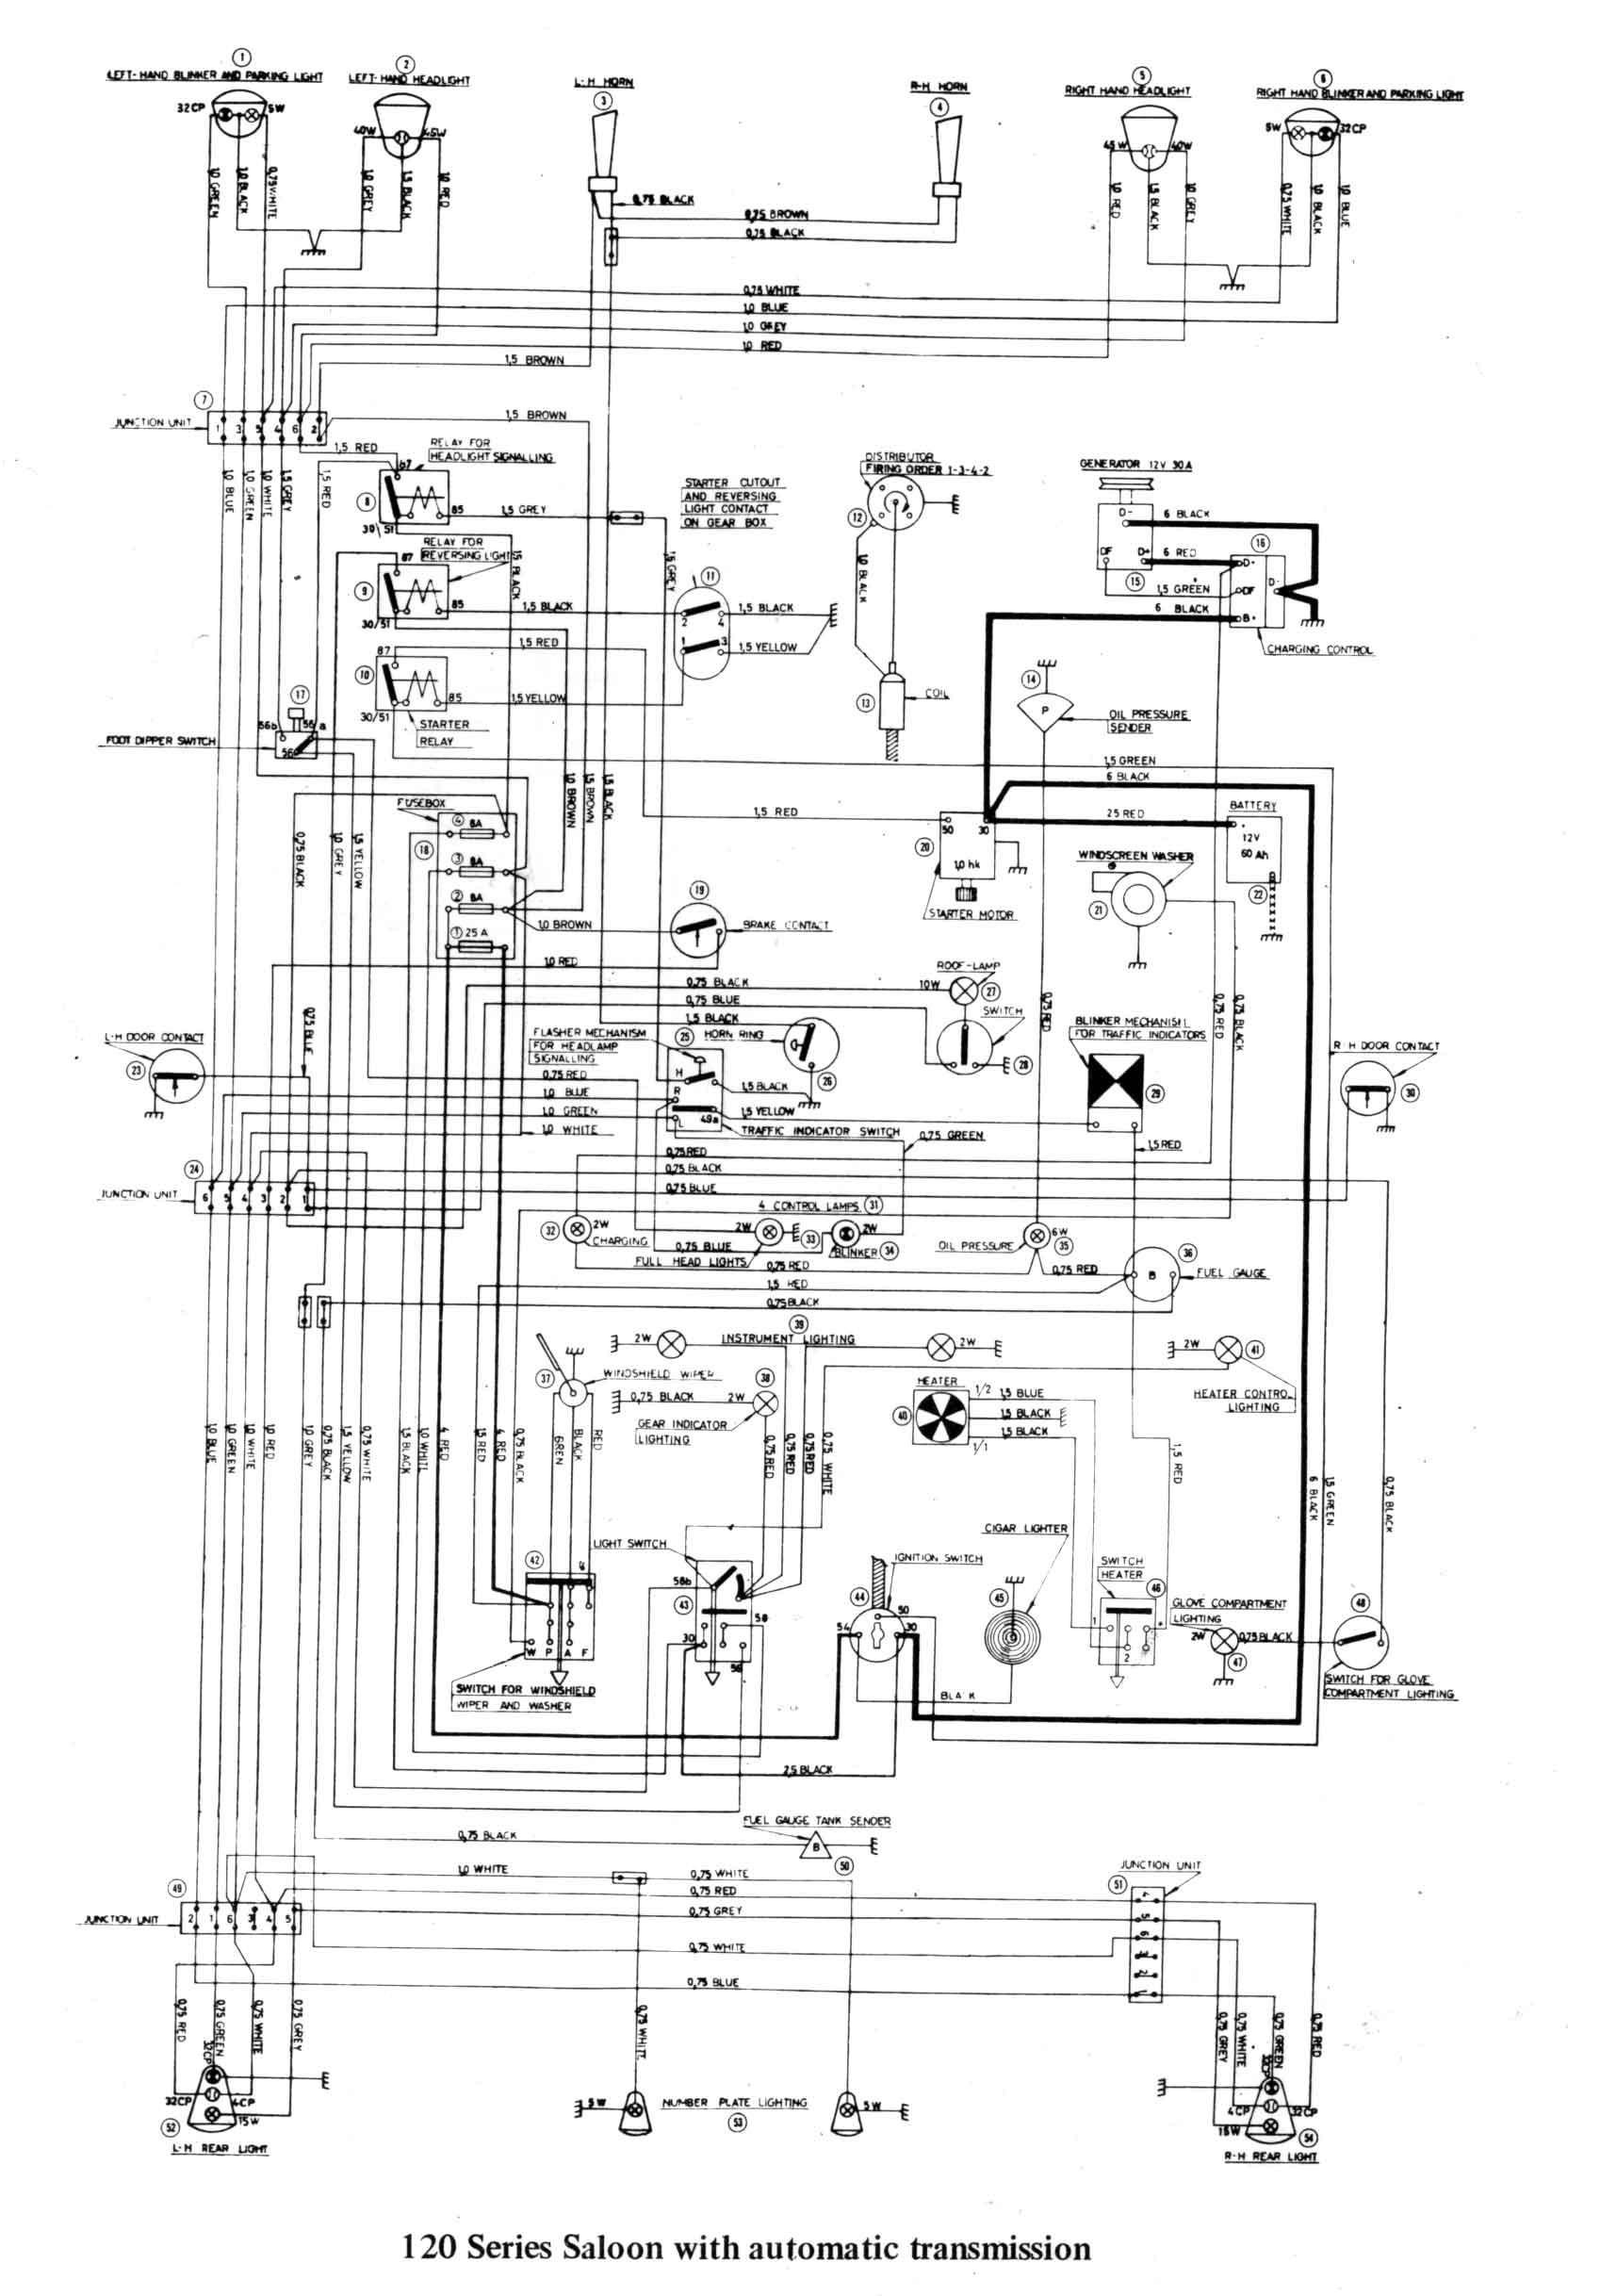 Volvo Truck Wiring Diagrams Horn Wiring Diagram Luxury Sw Em Od Retrofitting A Vintage Volvo Of Volvo Truck Wiring Diagrams